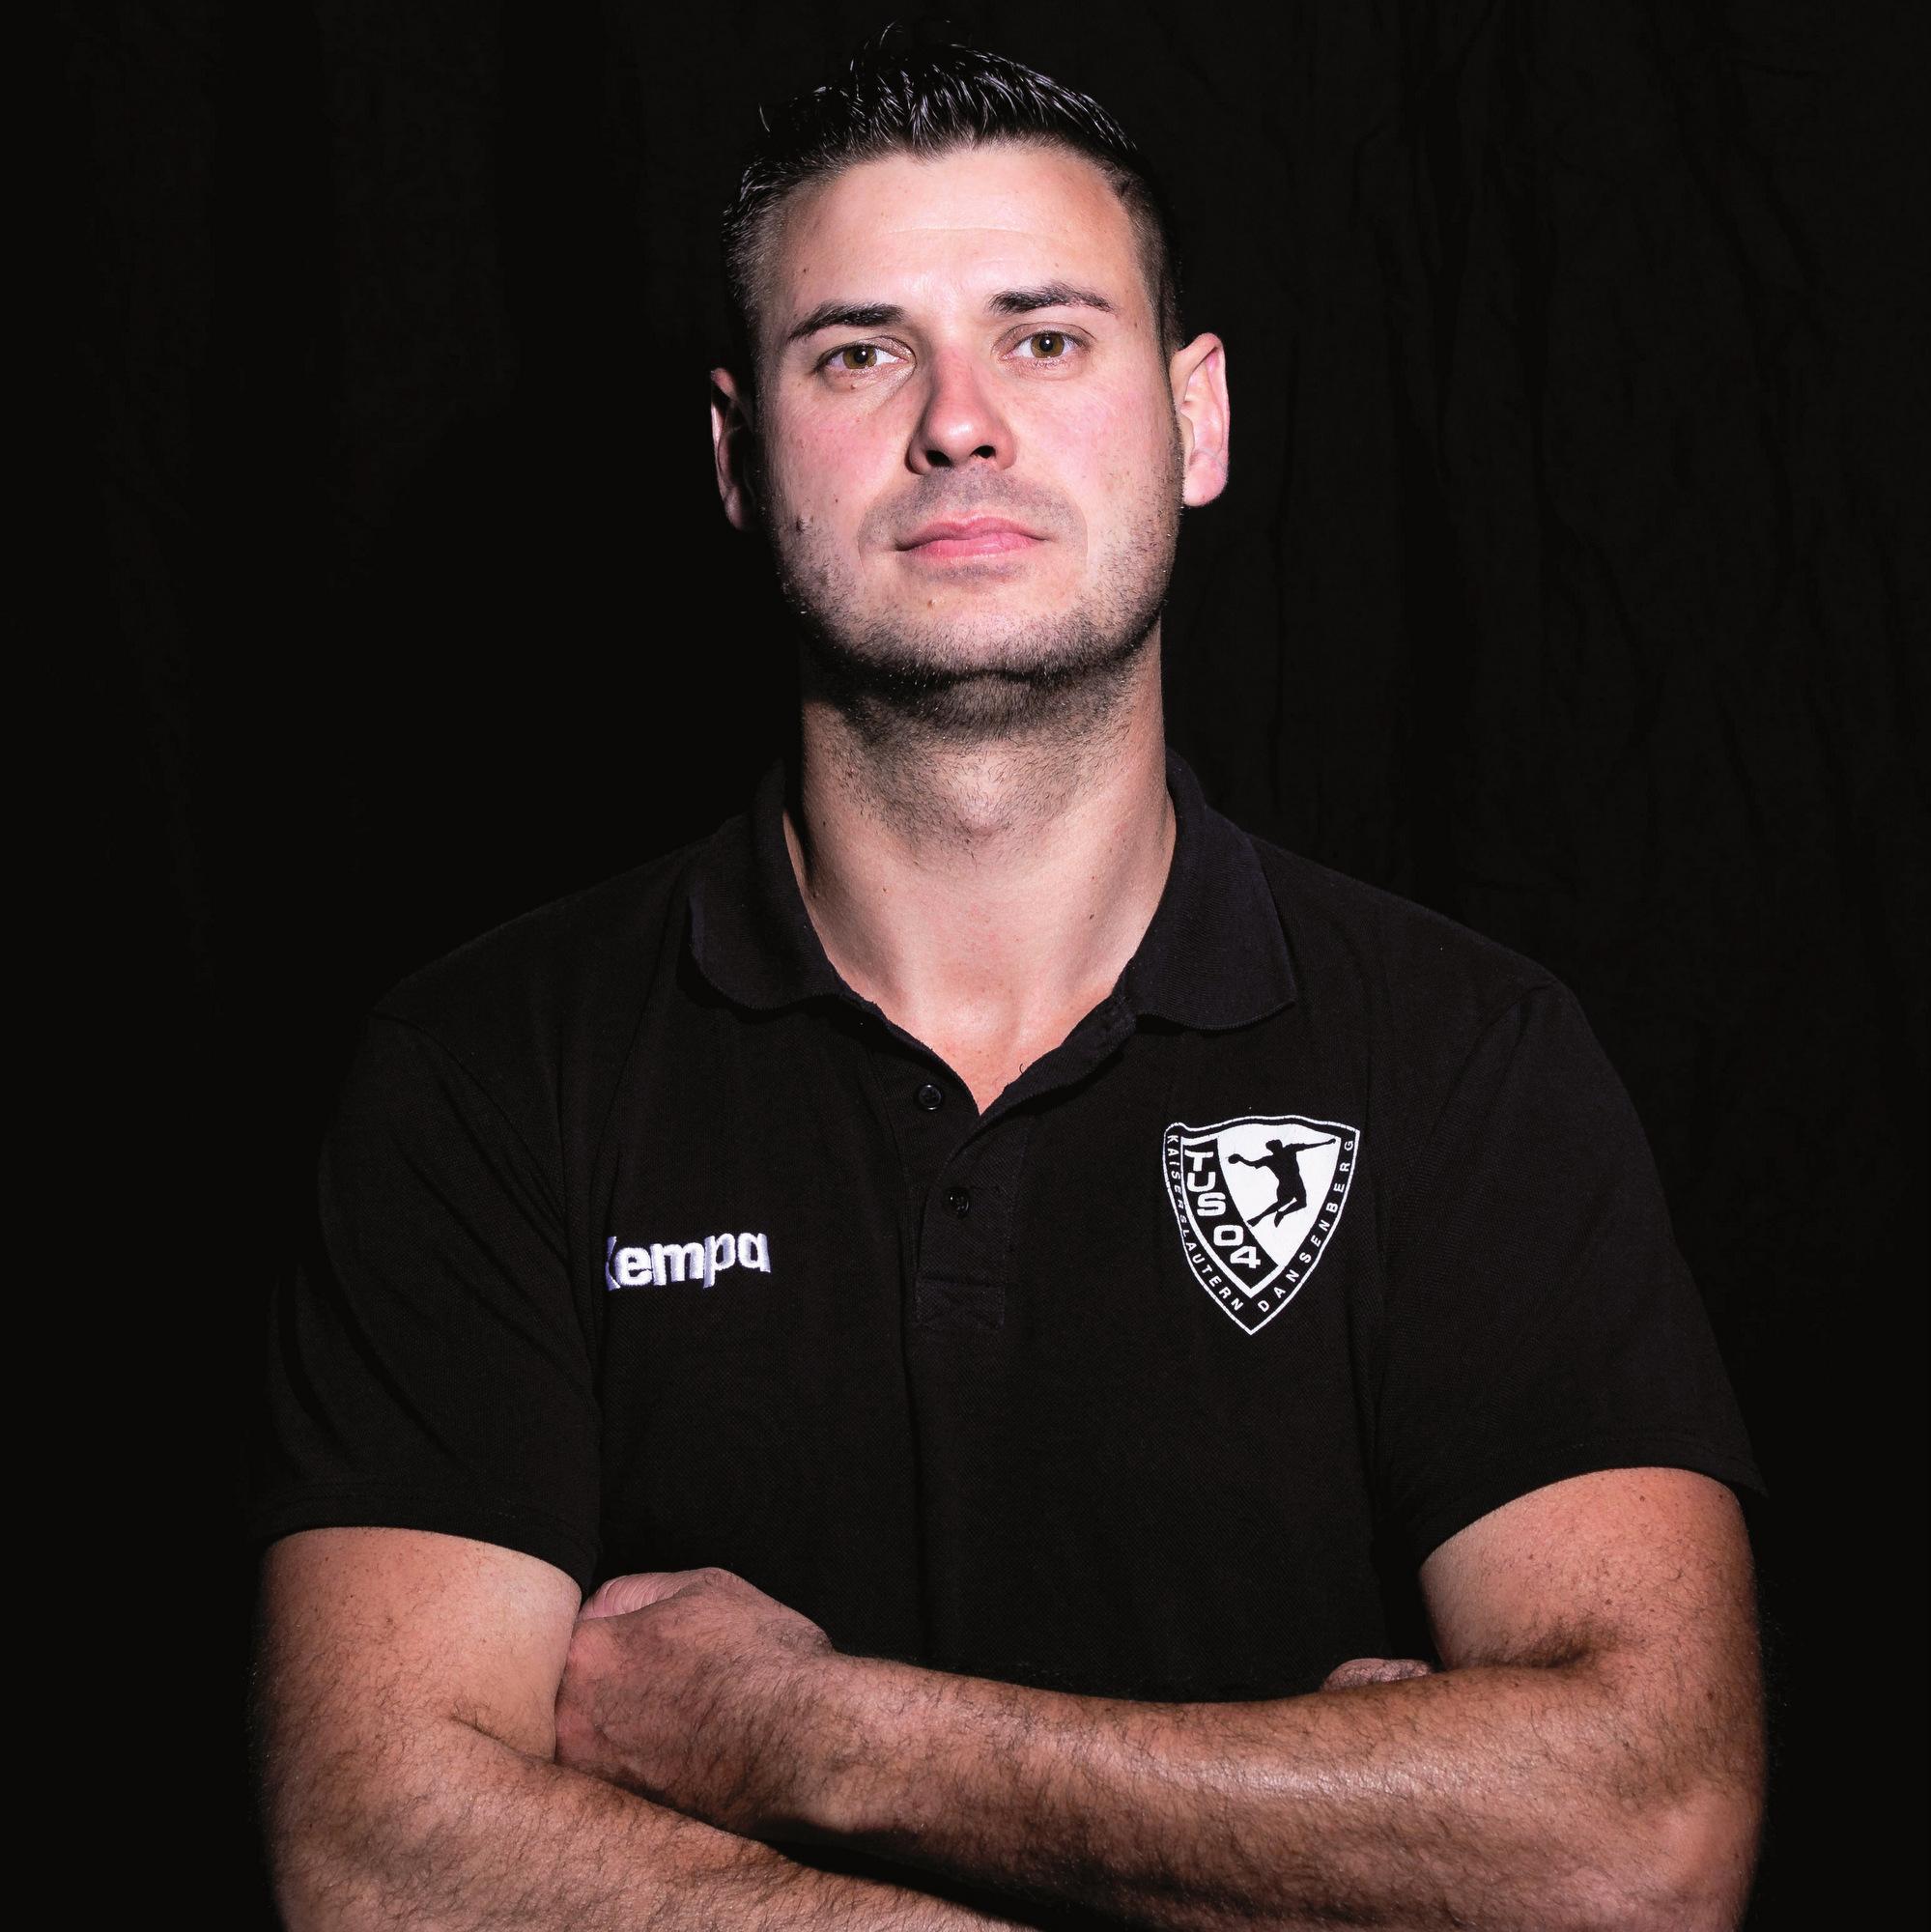 Marco Sliwa zurück in Dansenberg